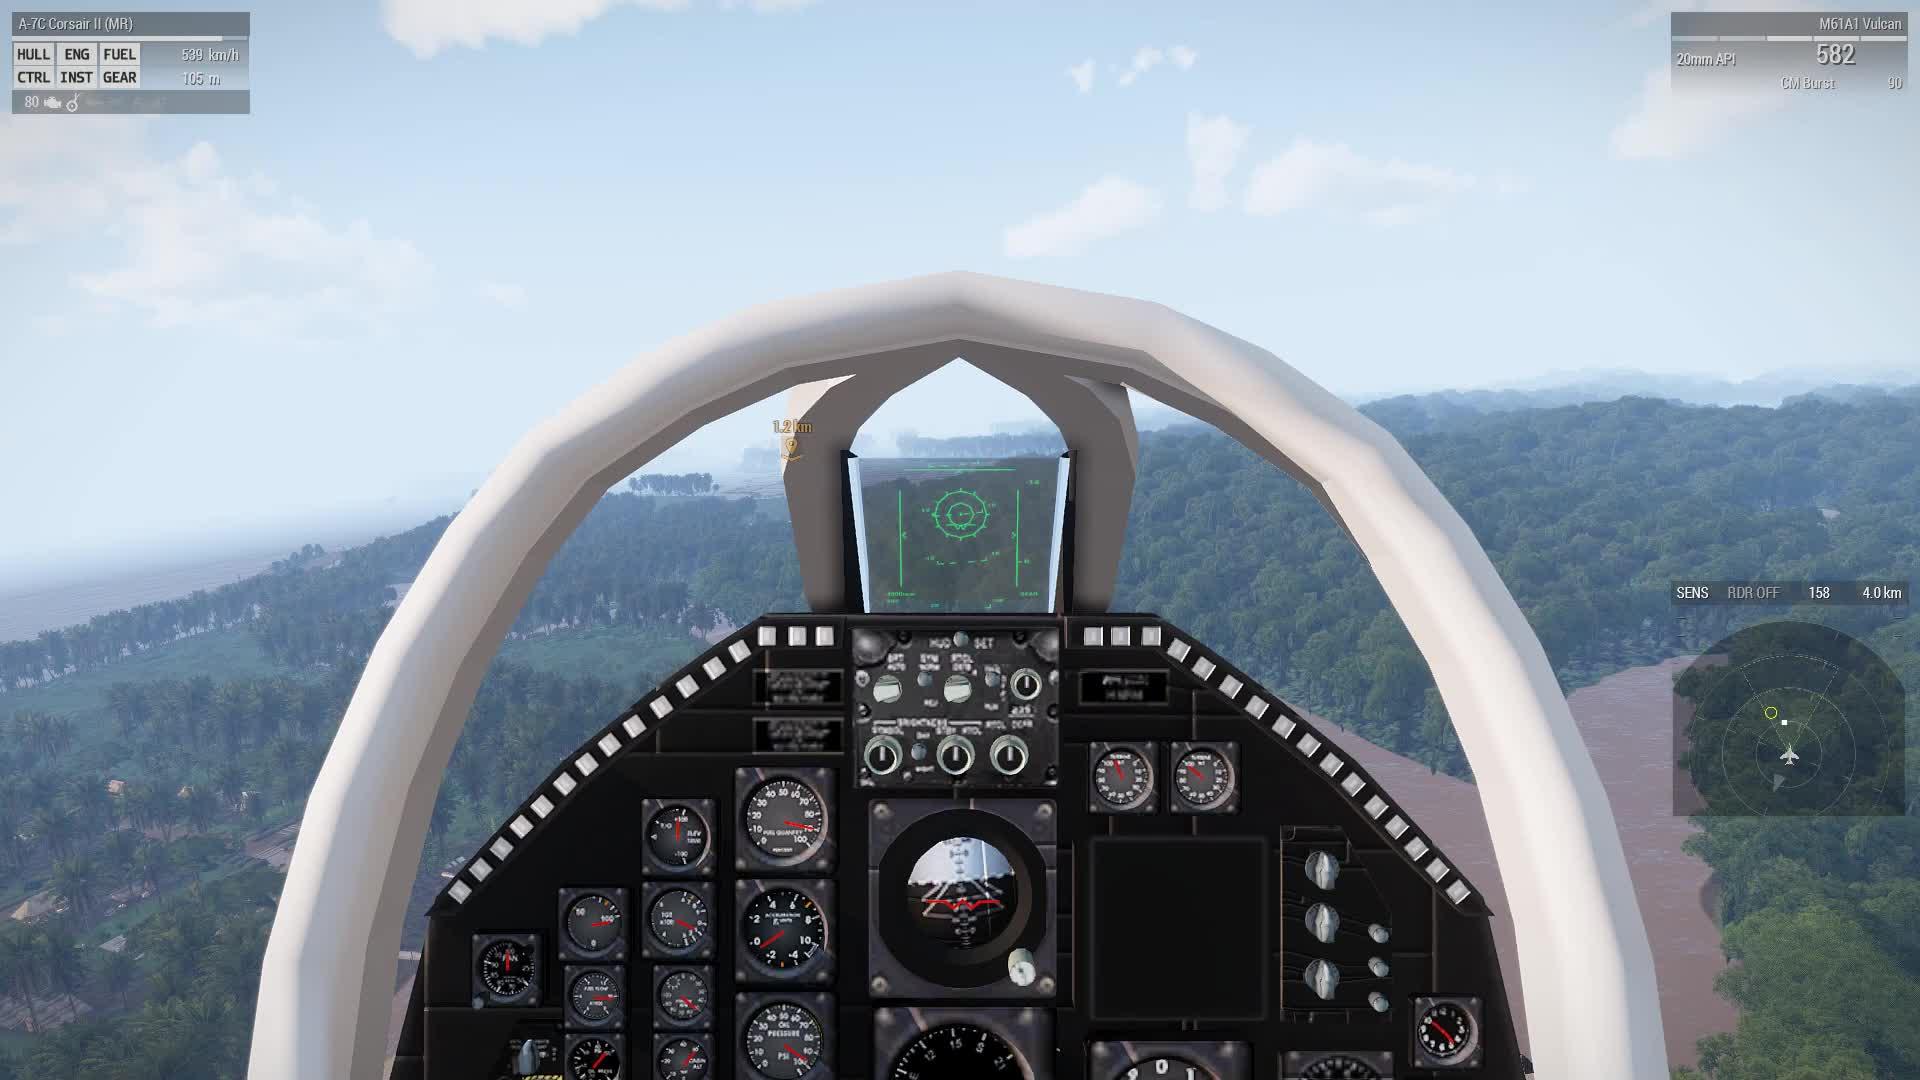 flying GIFs